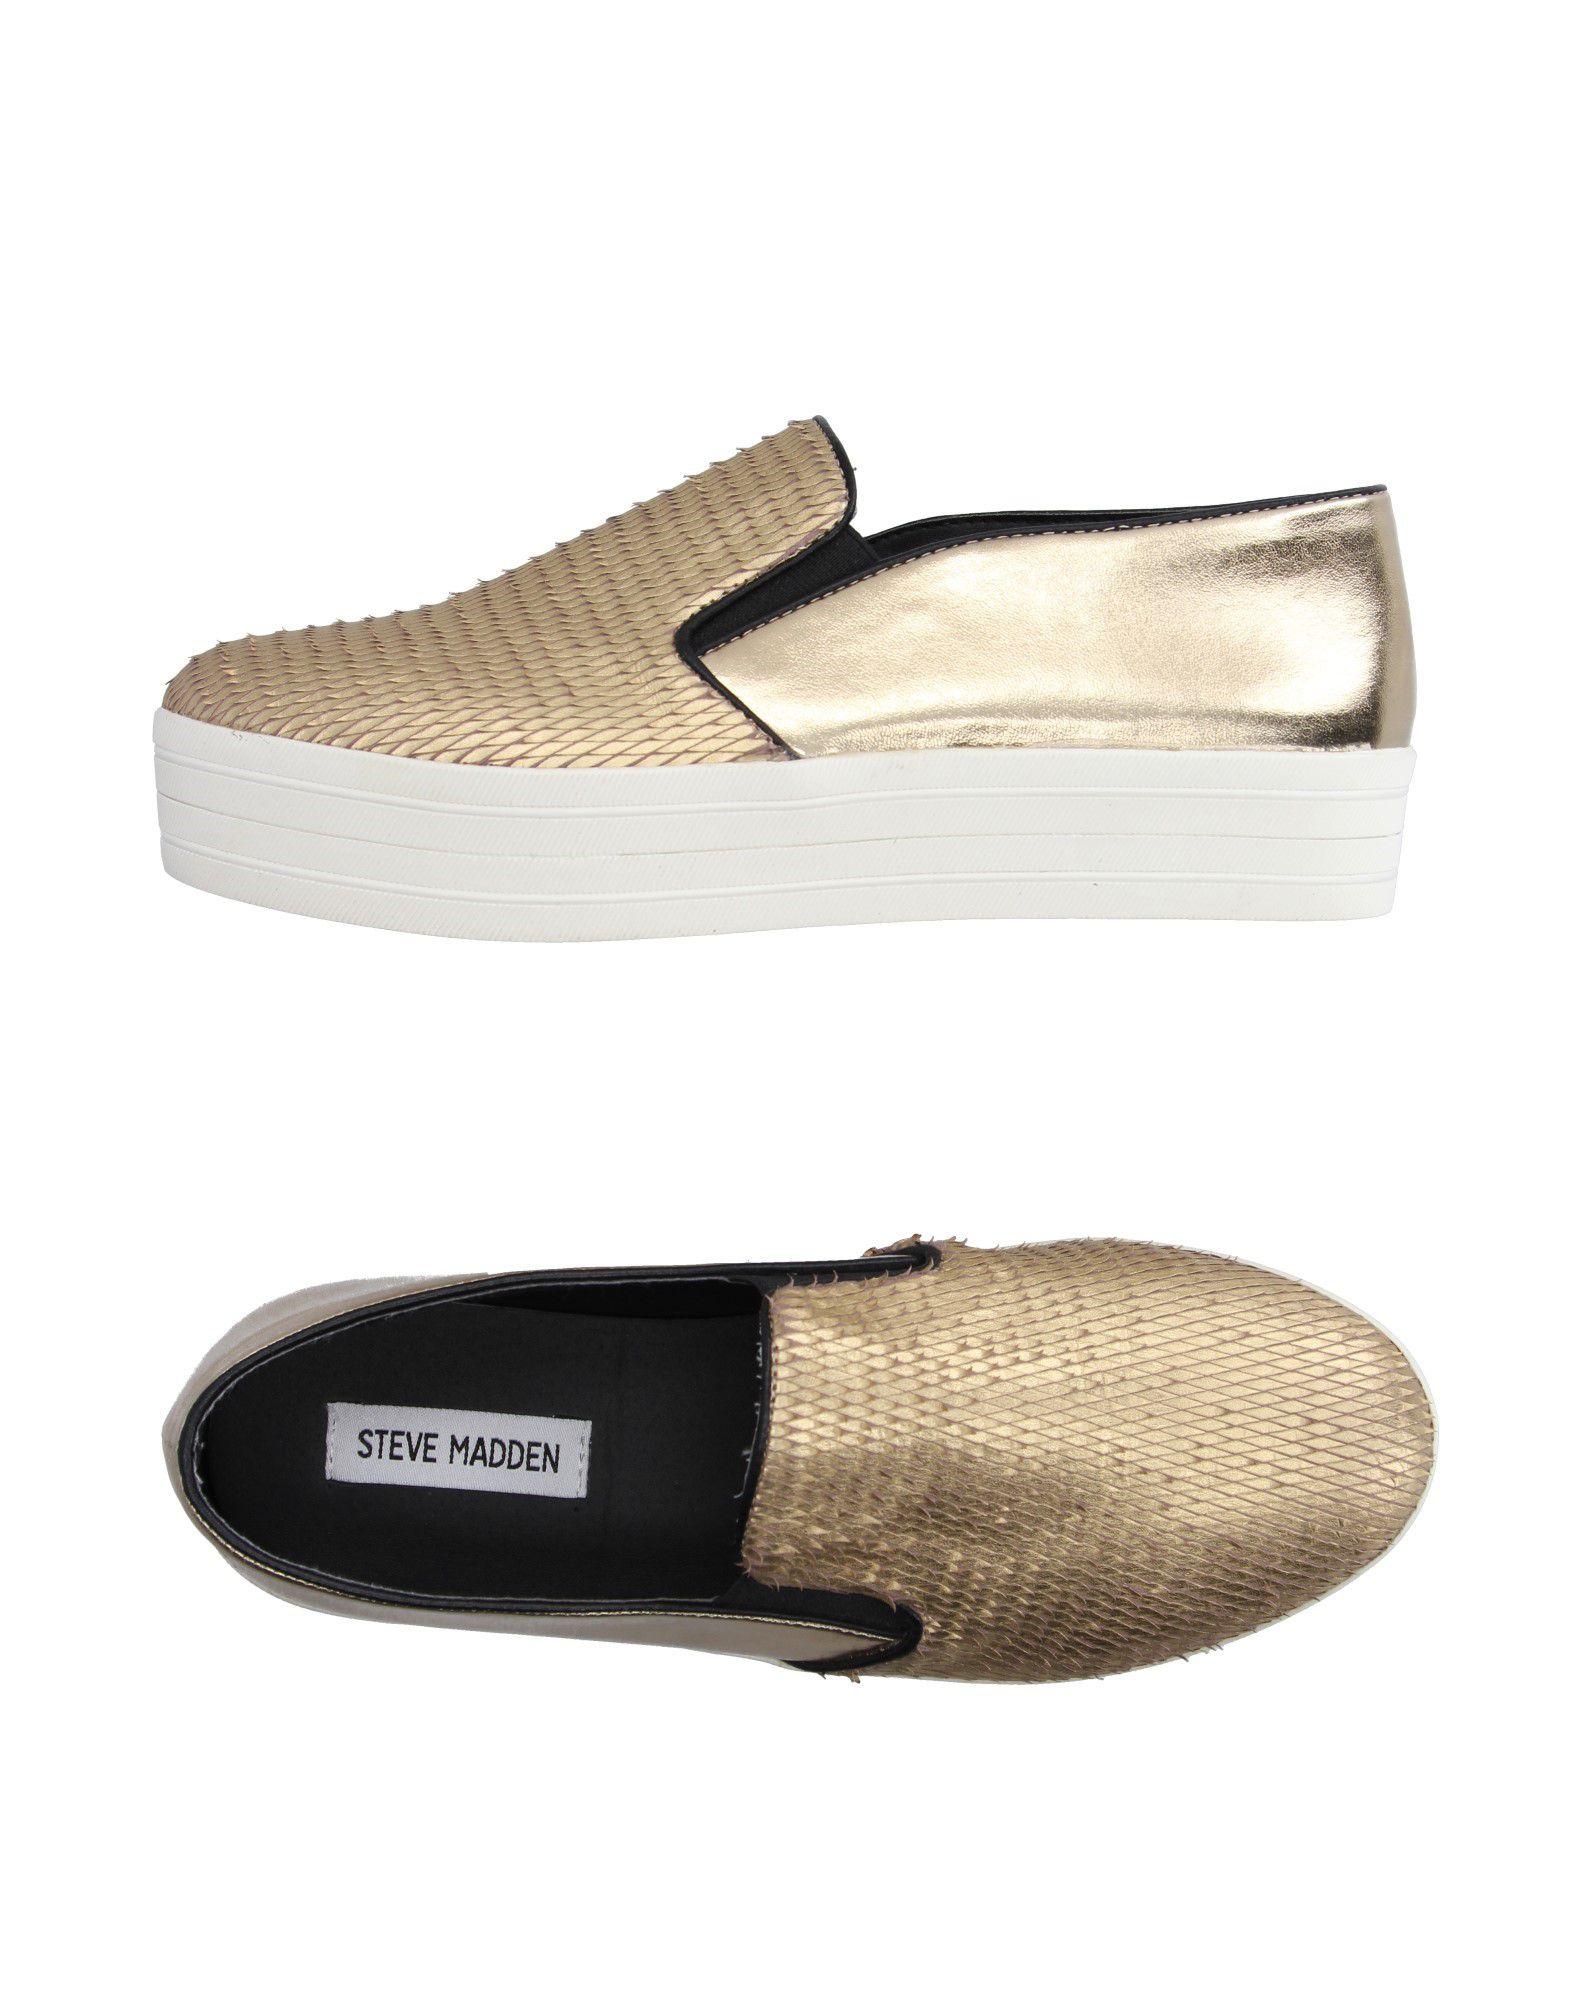 bc02b8f0ef8 Steve Madden Slip On Sneakers - Buy Best Steve Madden Slip On Sneakers from  Fashion Influencers | Brick & Portal